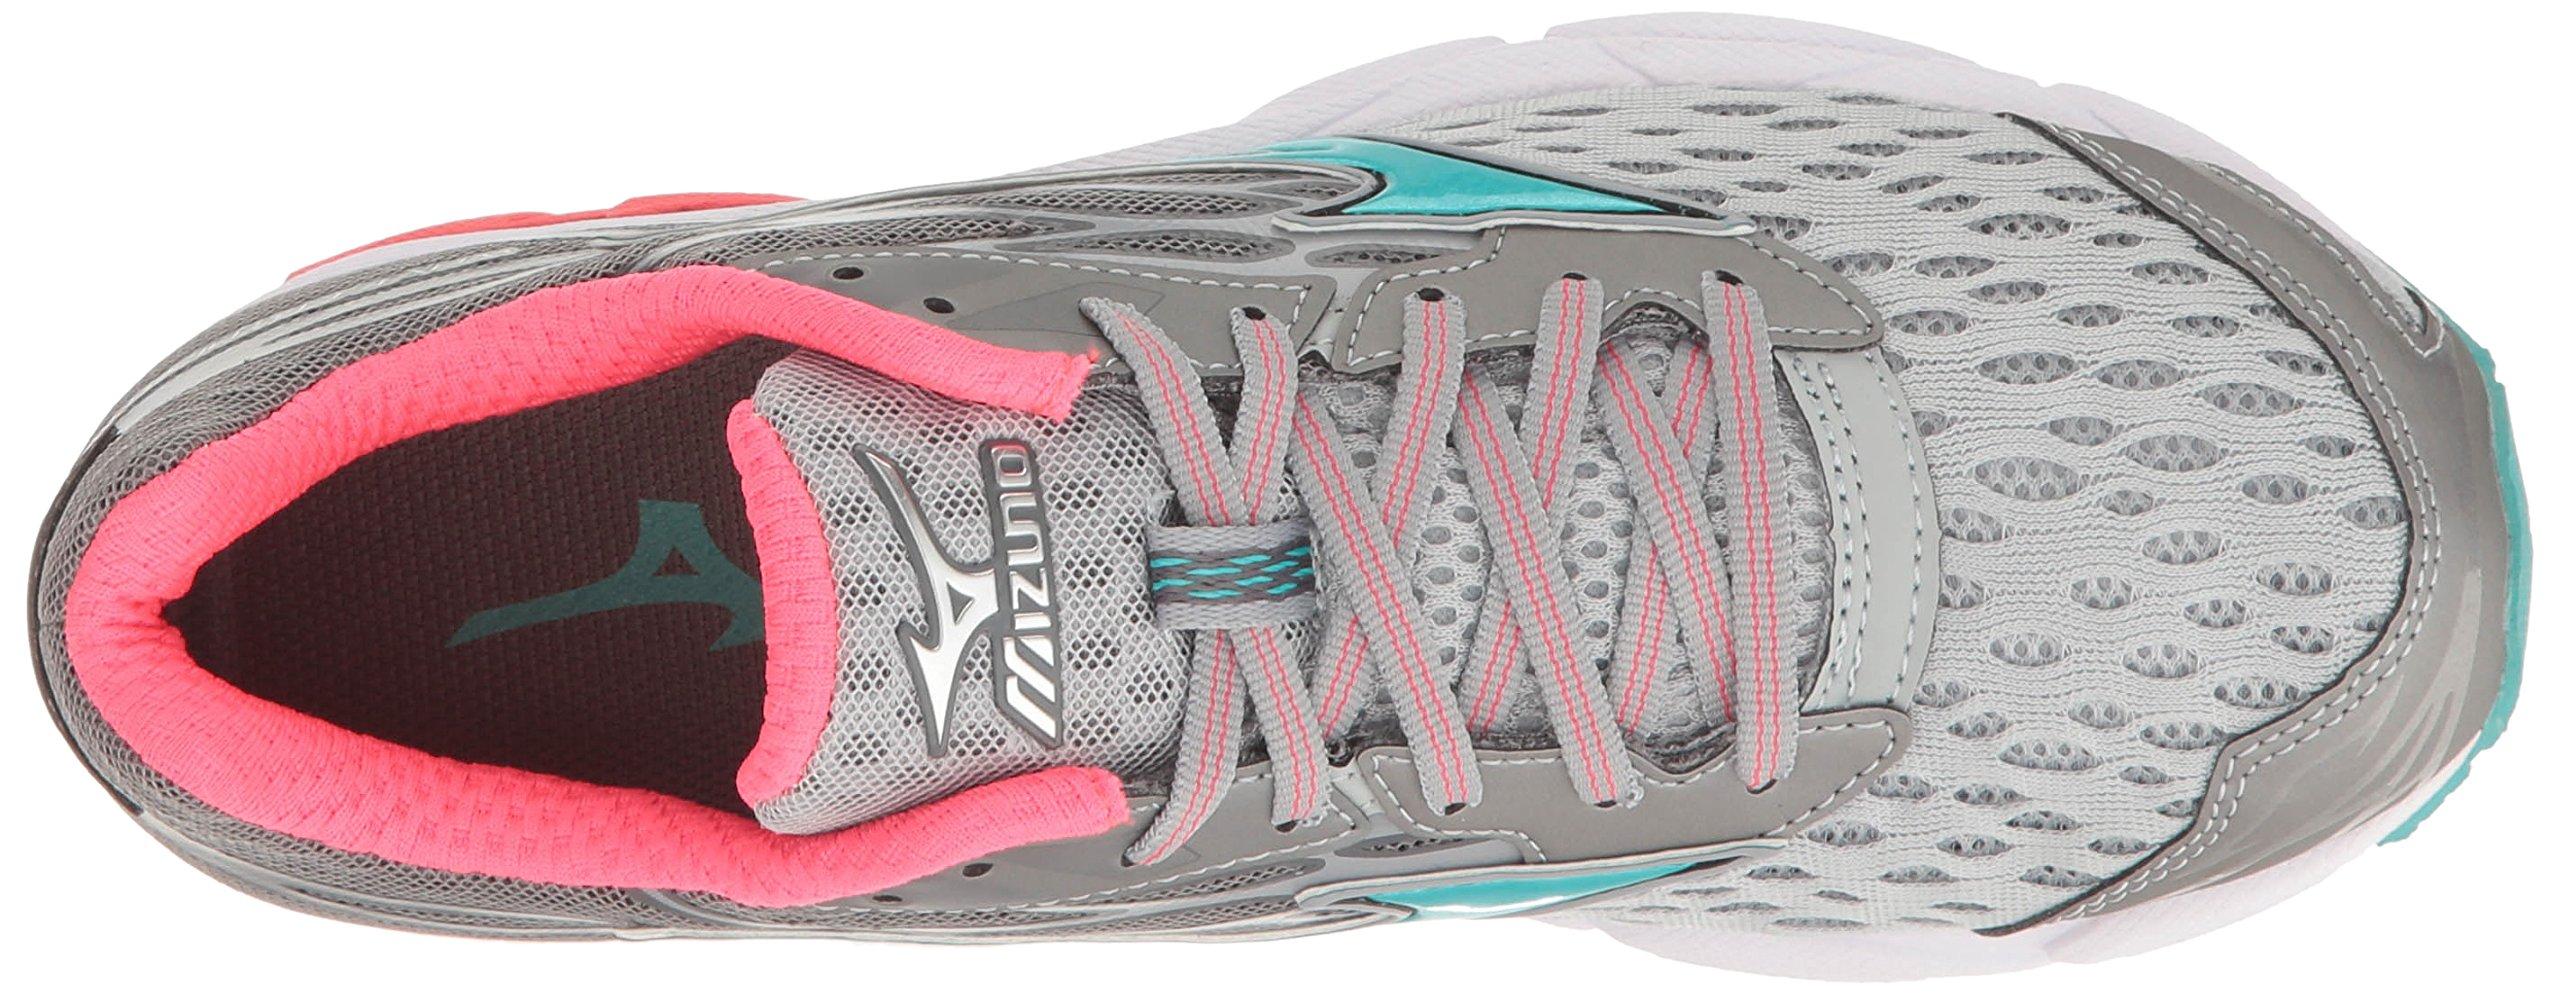 Mizuno Women's Wave Catalyst 2 Running Shoe, Grey/Mint, 9 B US by Mizuno (Image #8)